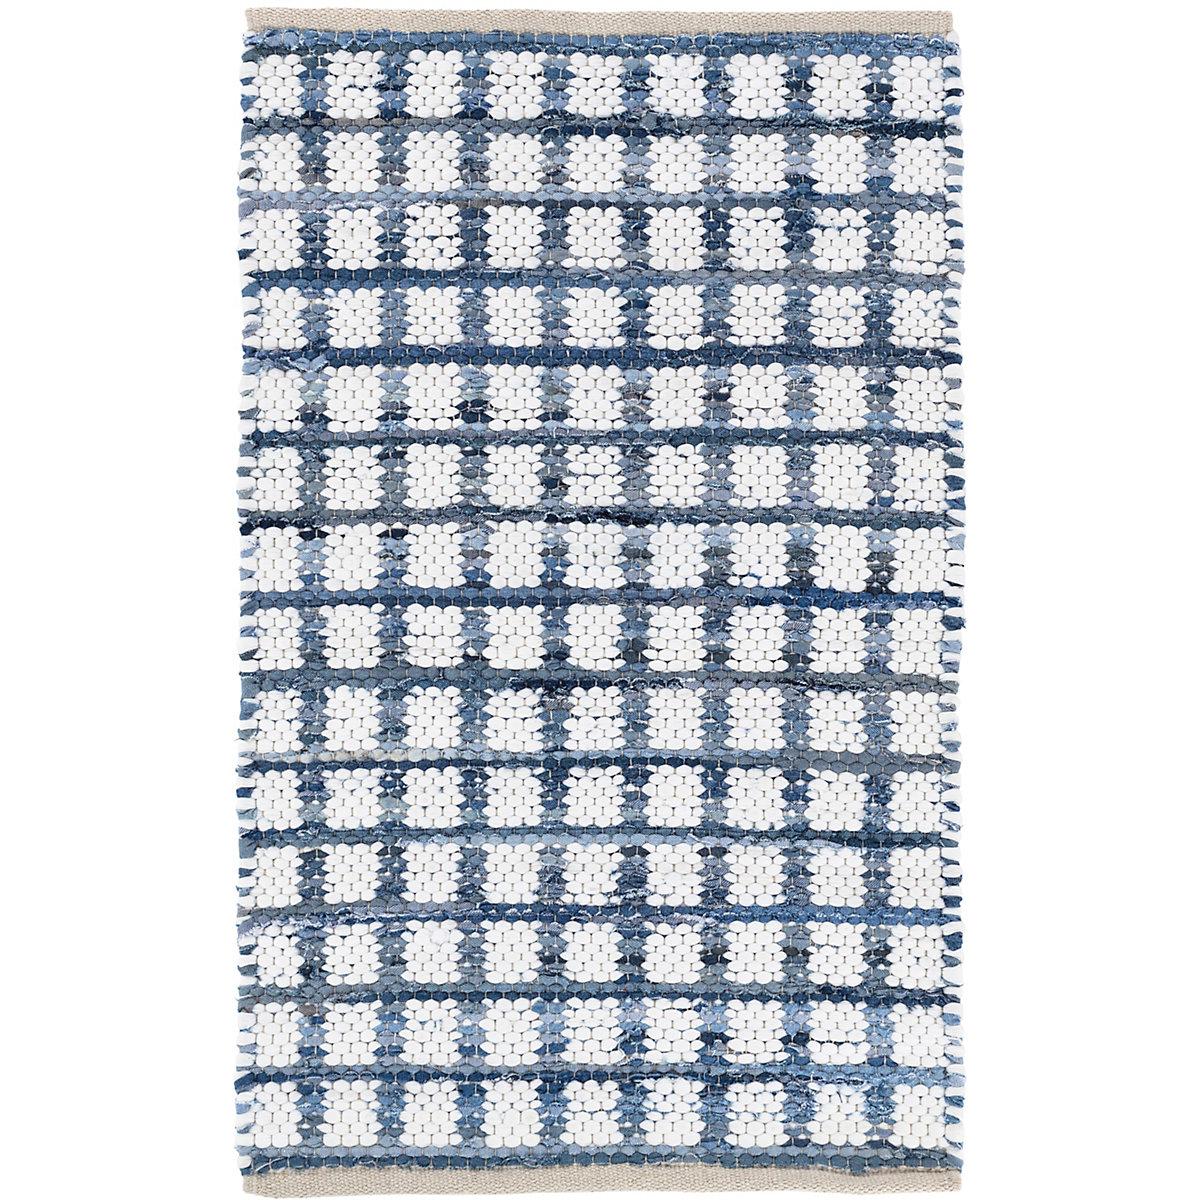 Denim Rag Squares Woven Cotton Rug Dash Amp Albert